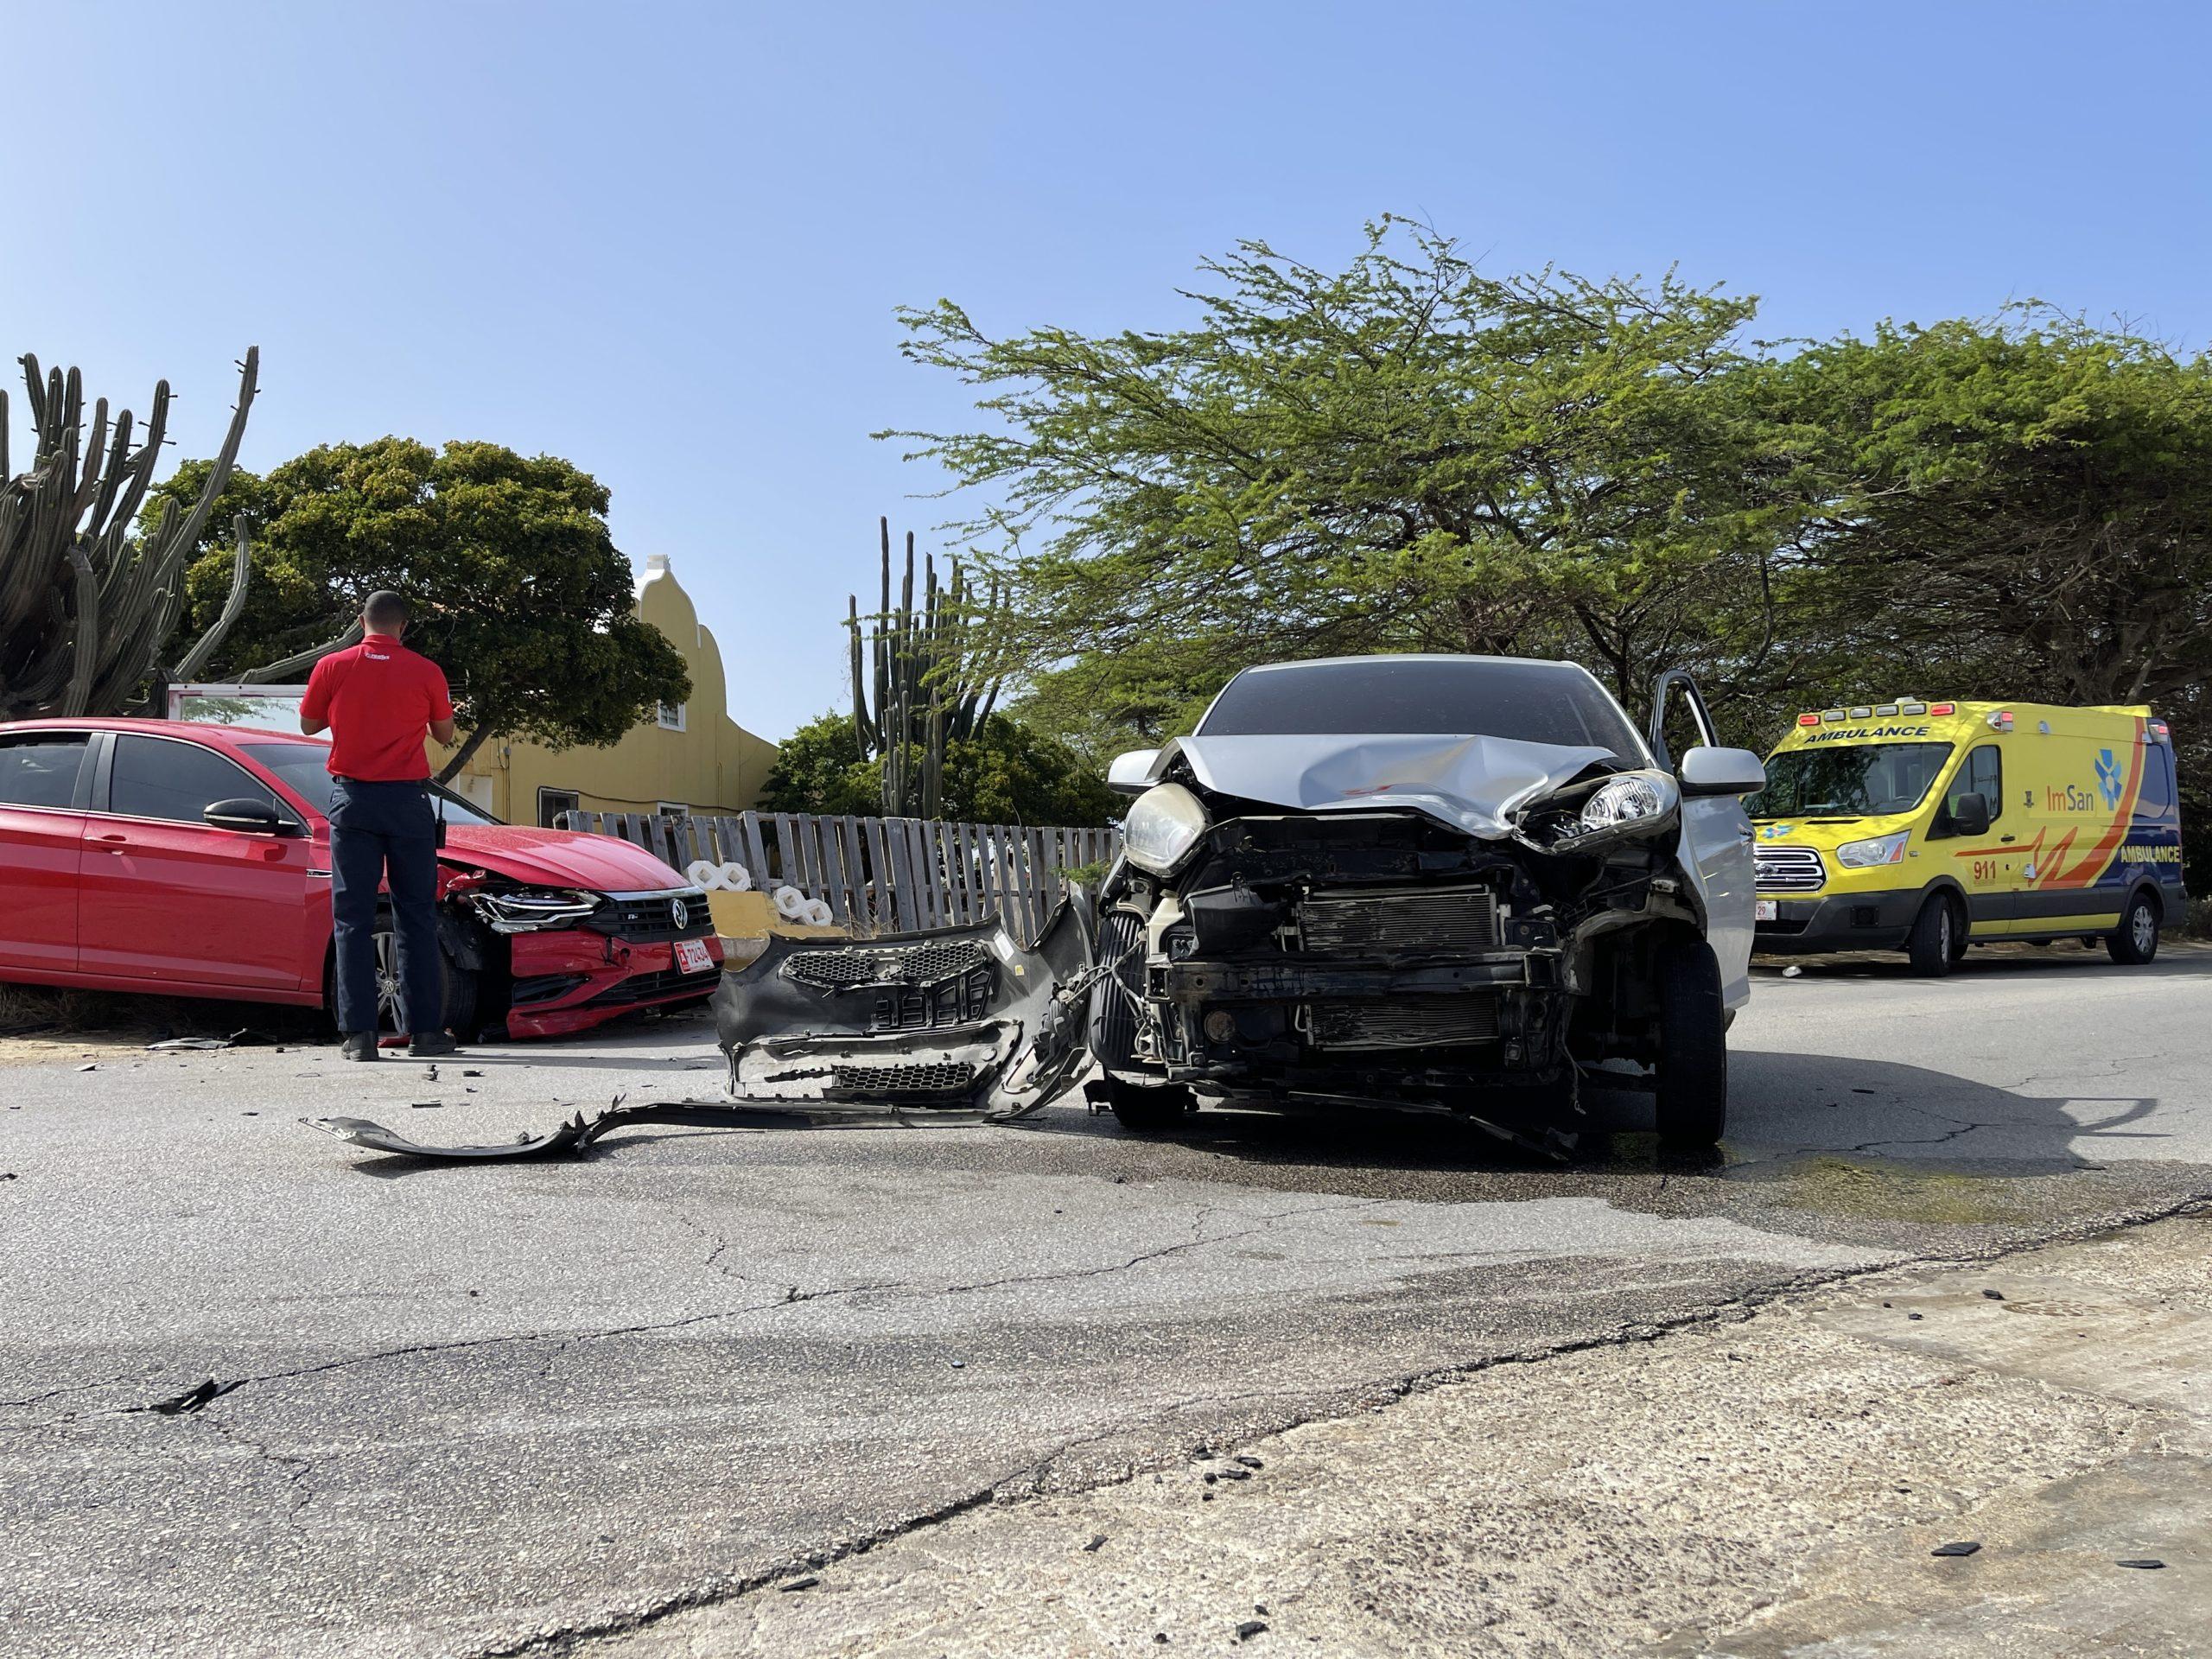 Hende herida den accidente di auto na Washington